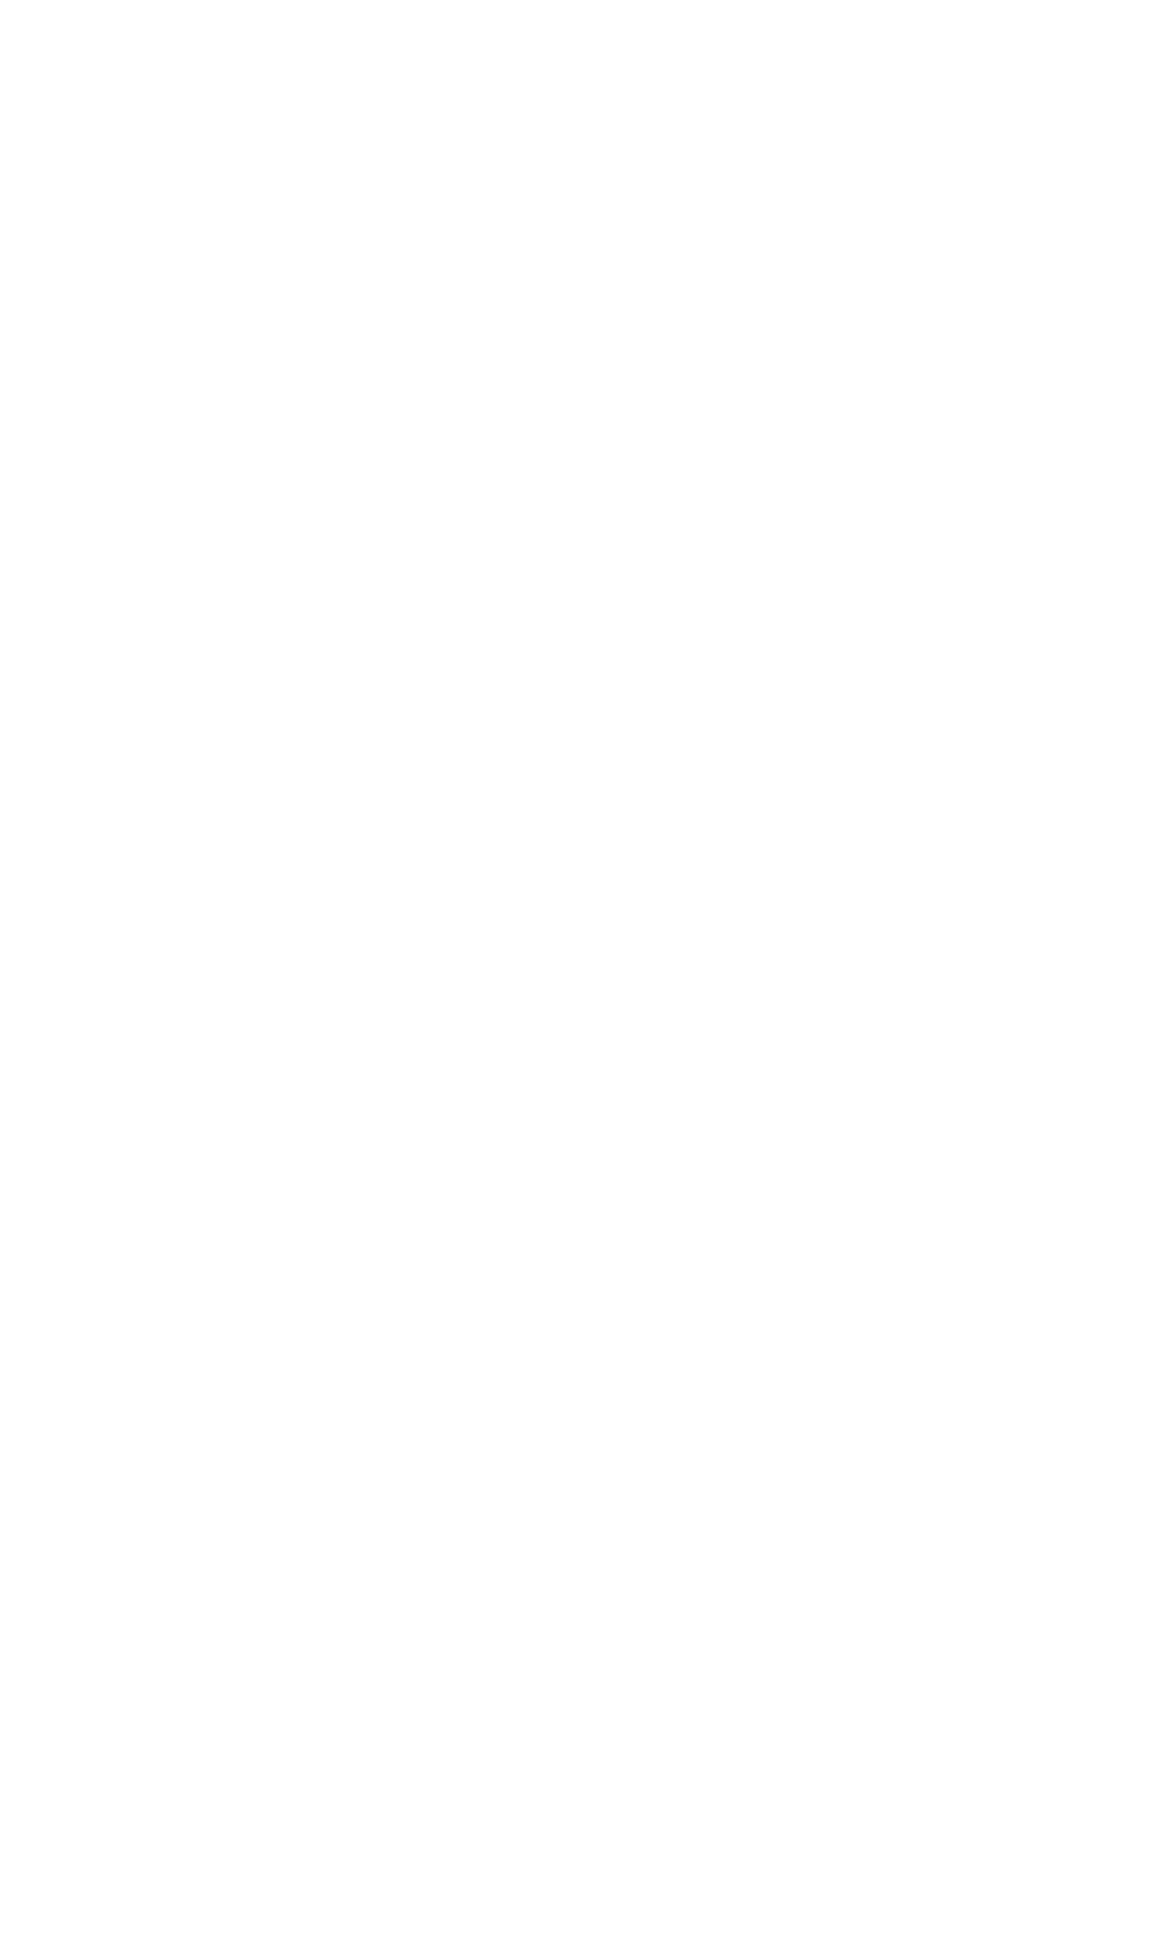 CamelDroppings_LogoConcept_MustaaliRaj